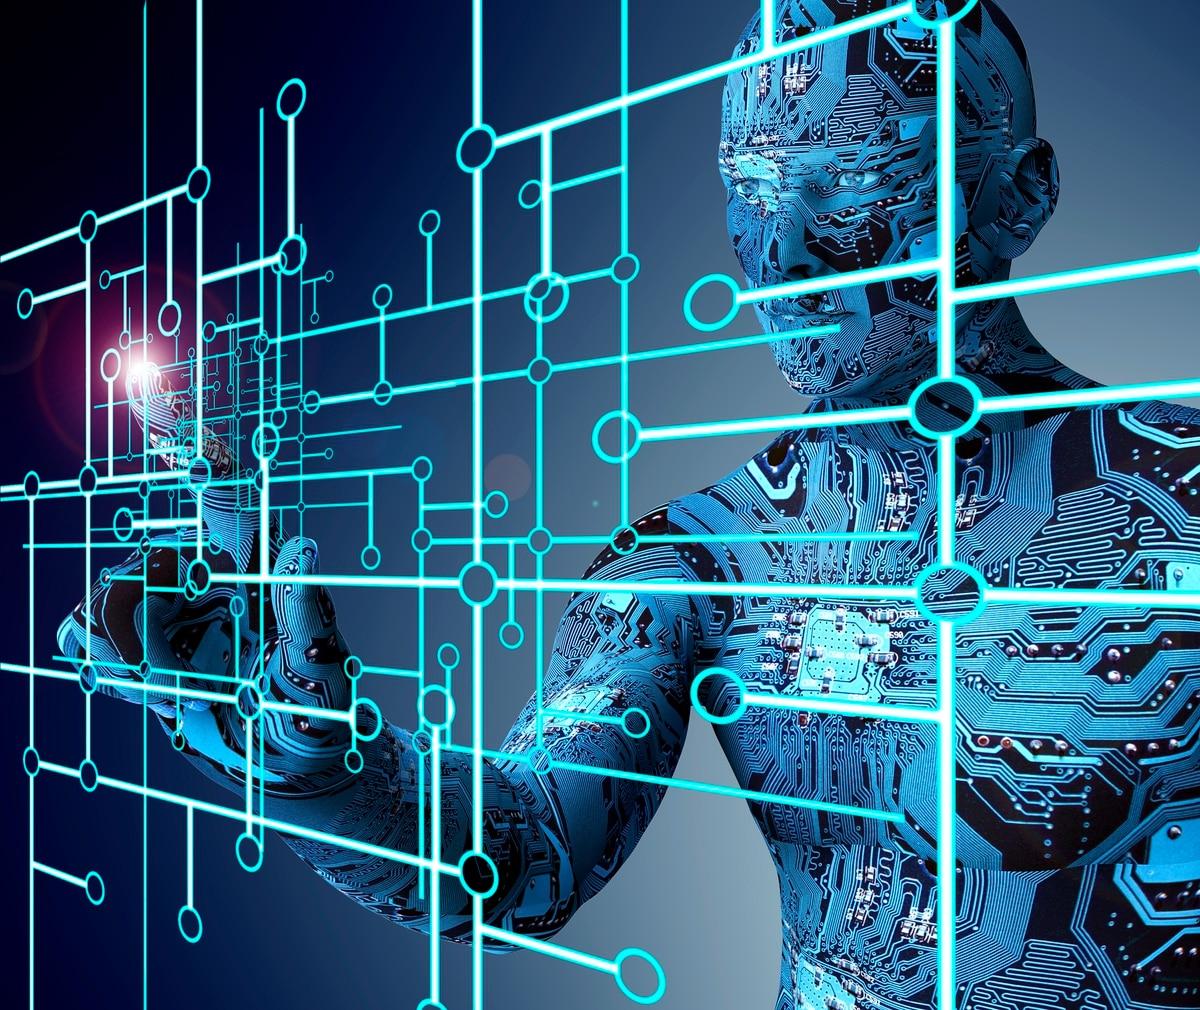 Cyber Electronic Warfare Integration Critical For Future